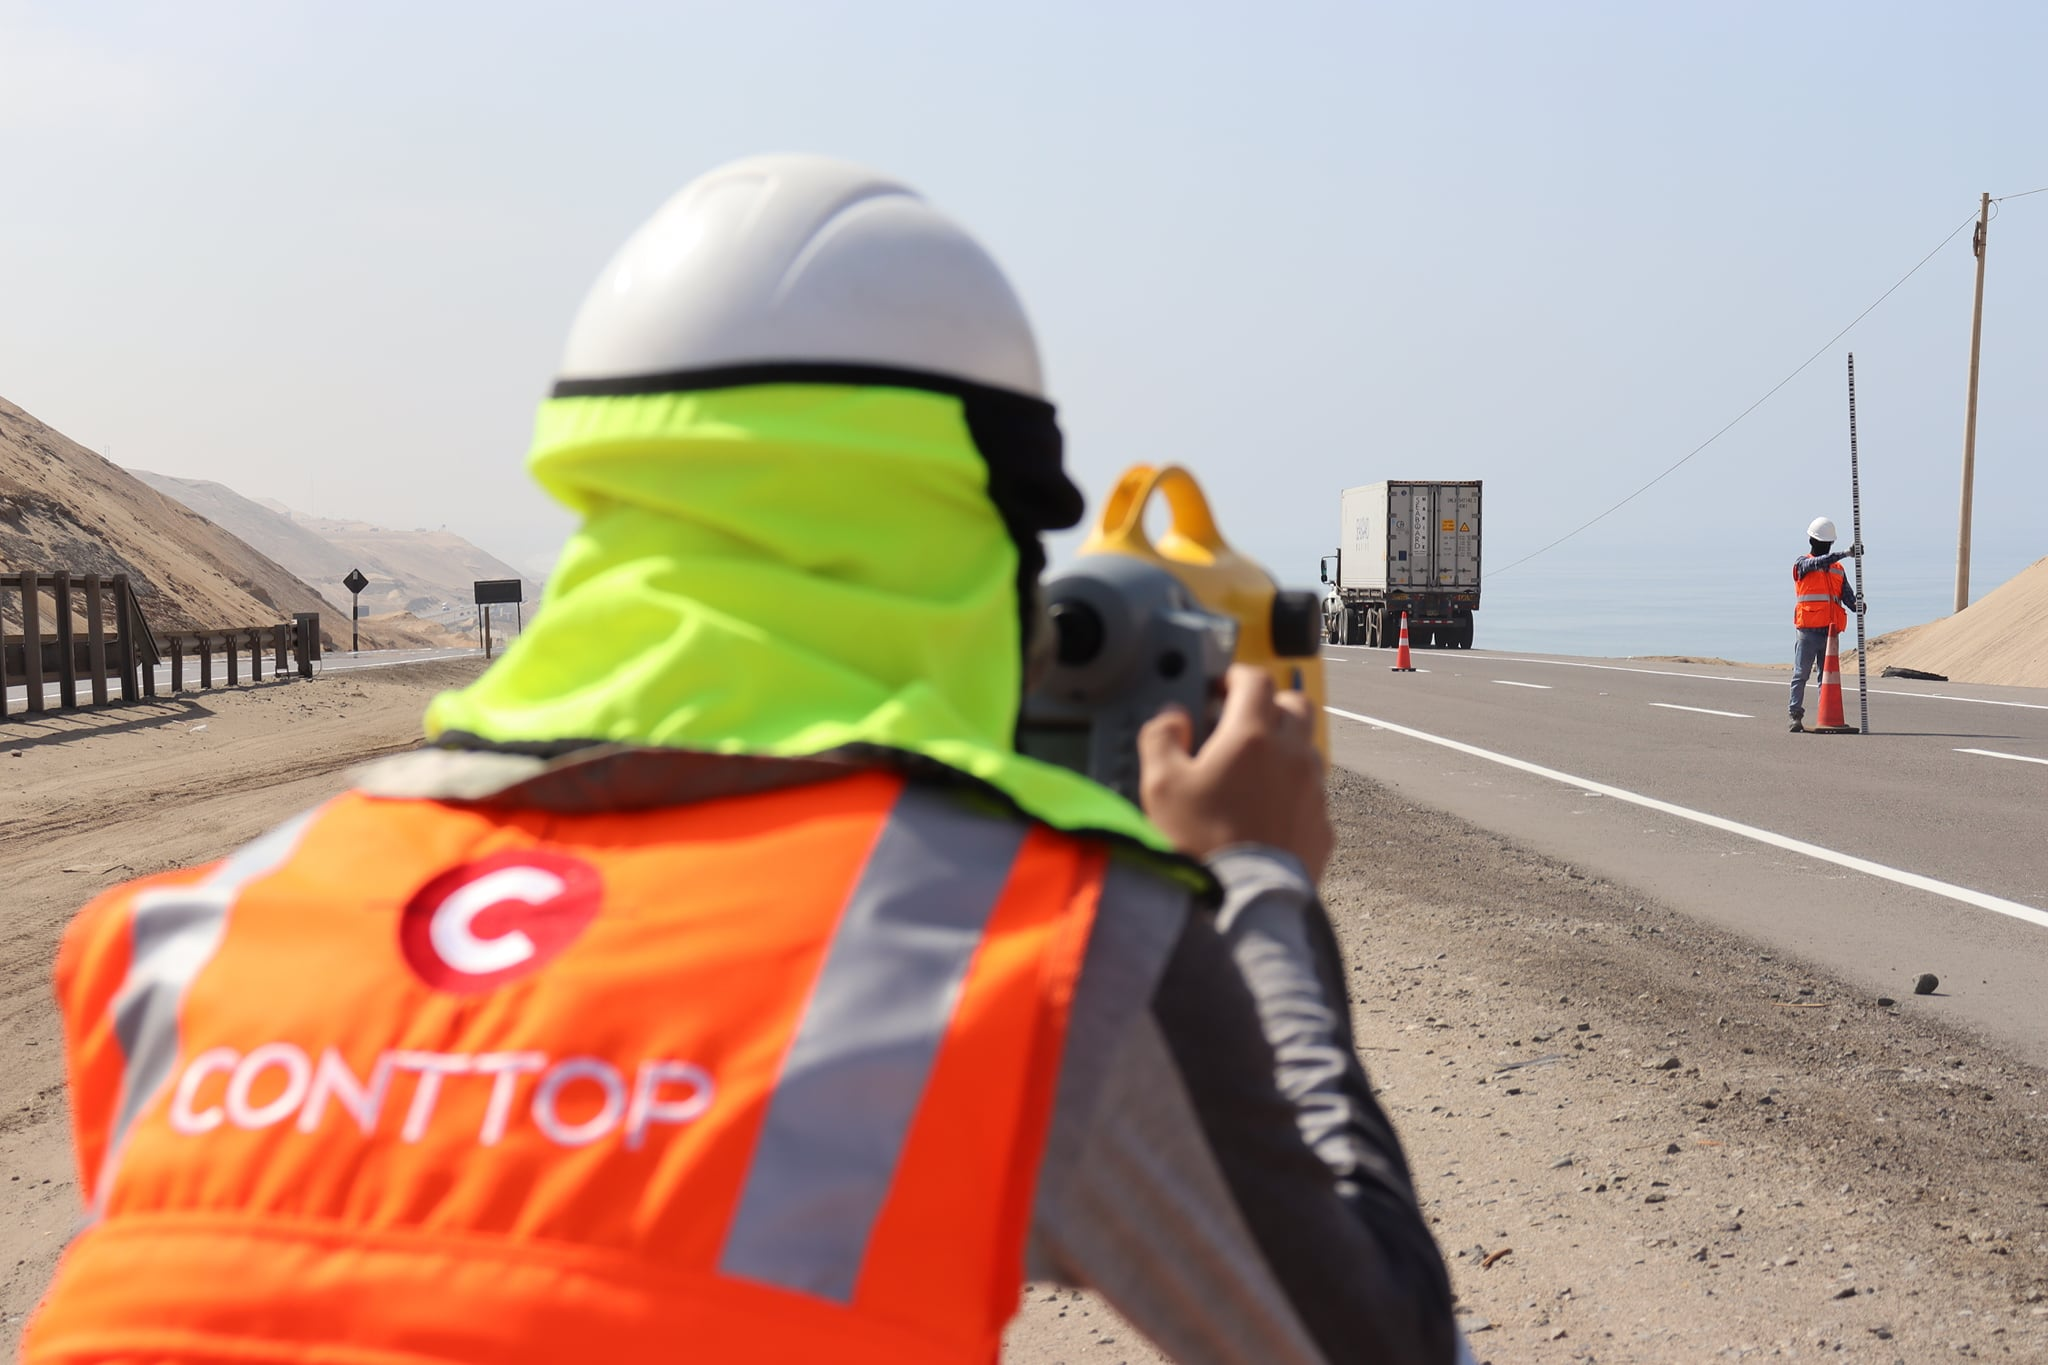 Monitoreo Topográfico Conttop